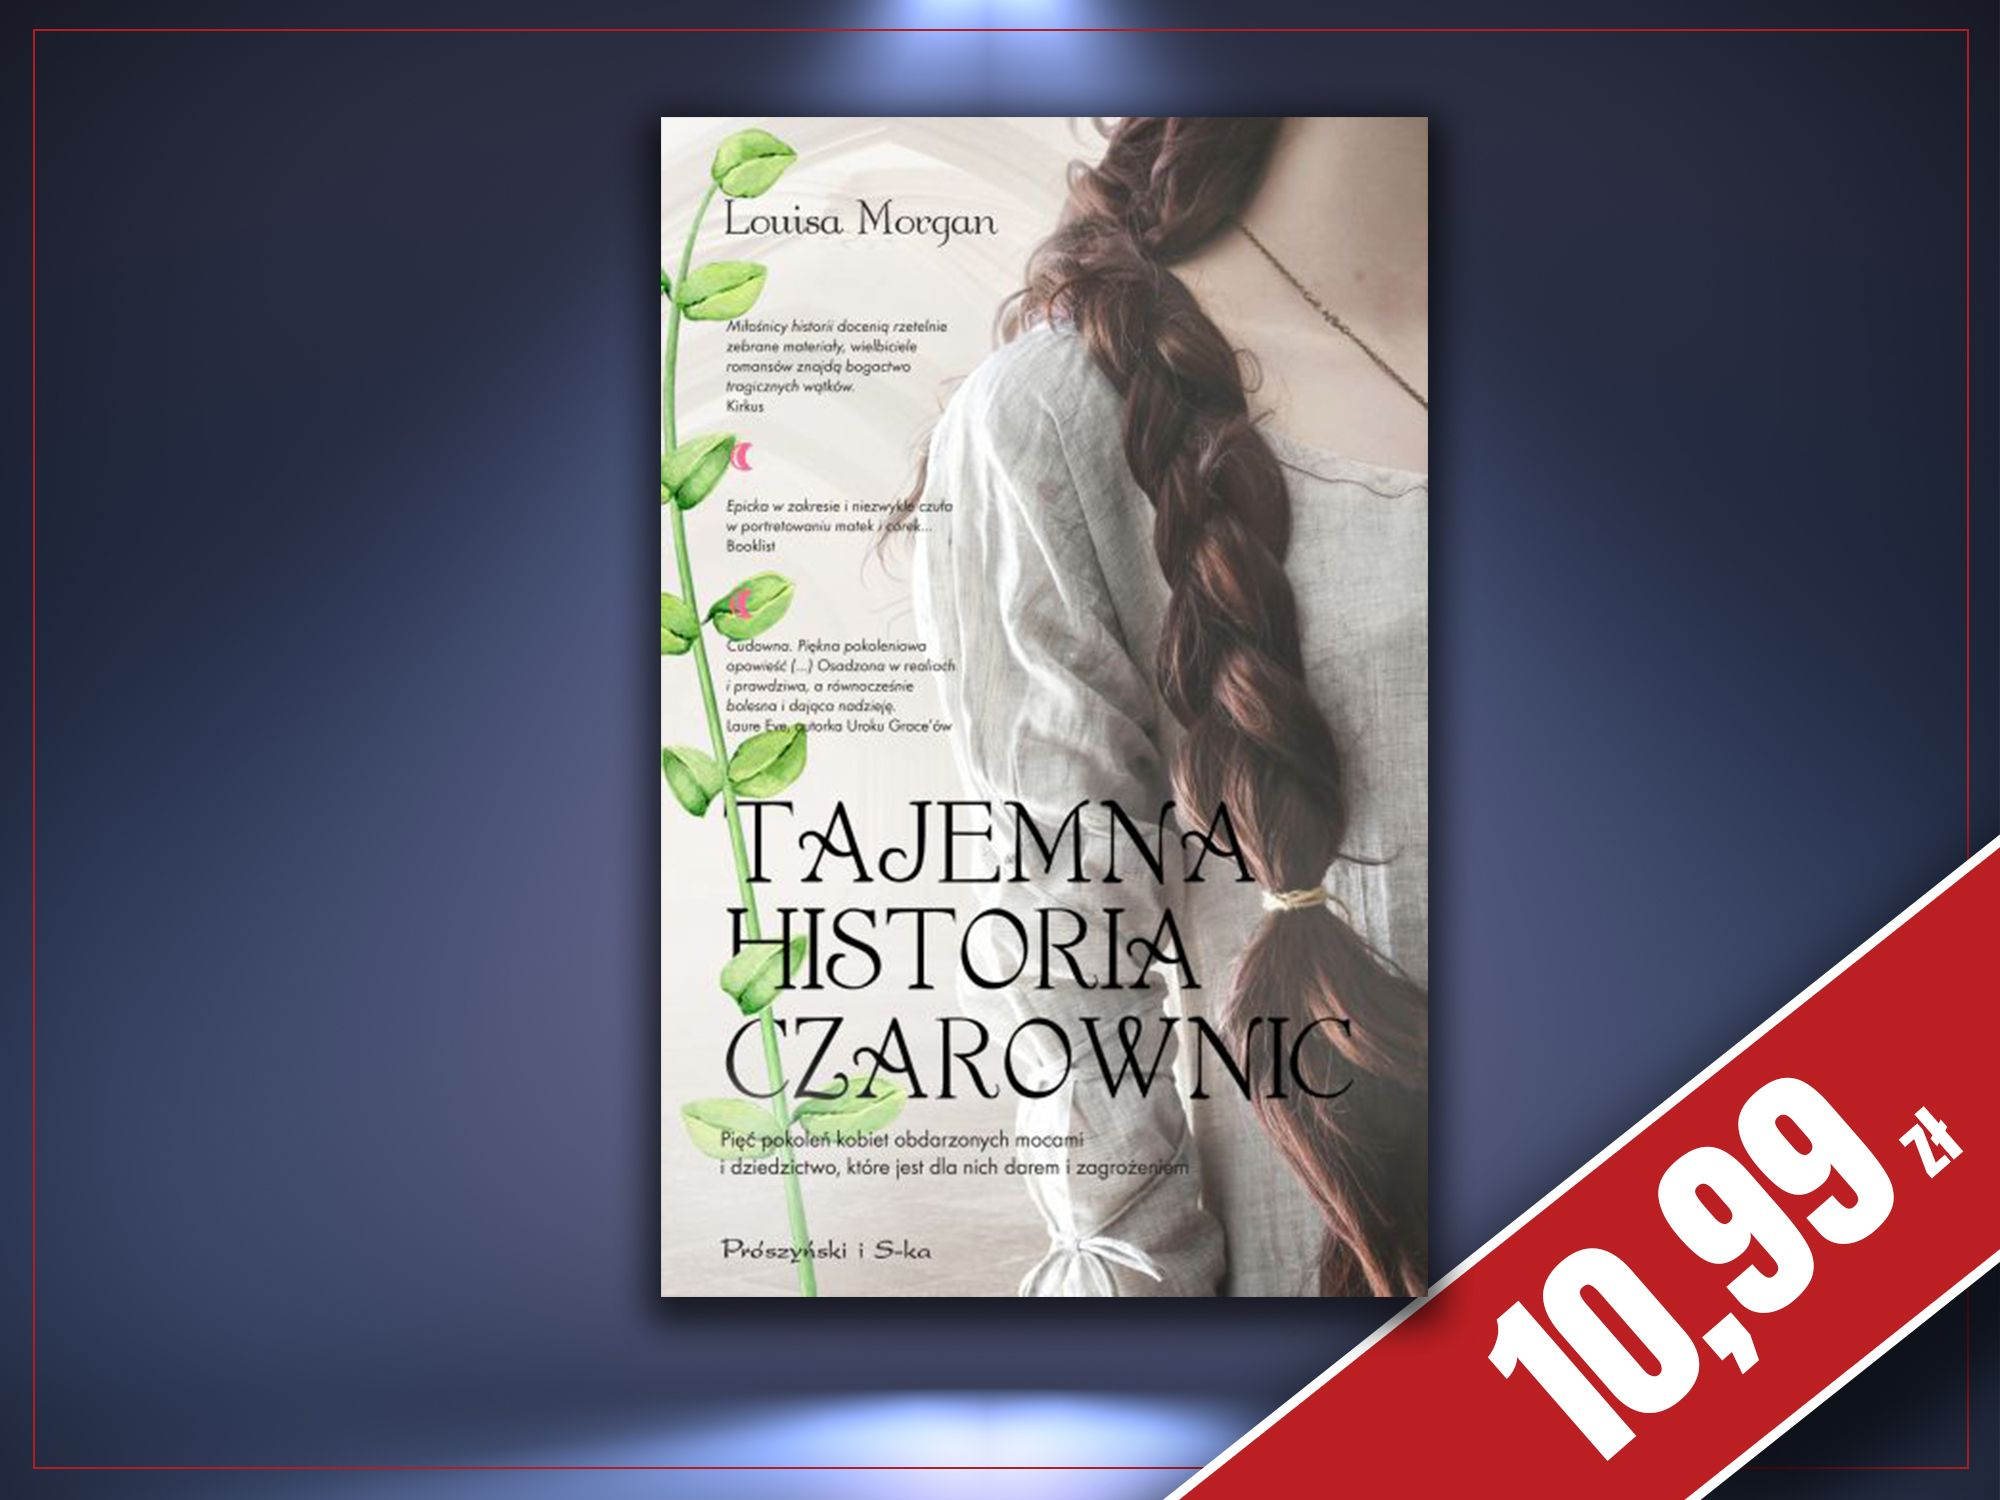 Tajemna historia czarownic, Louisa Morgan